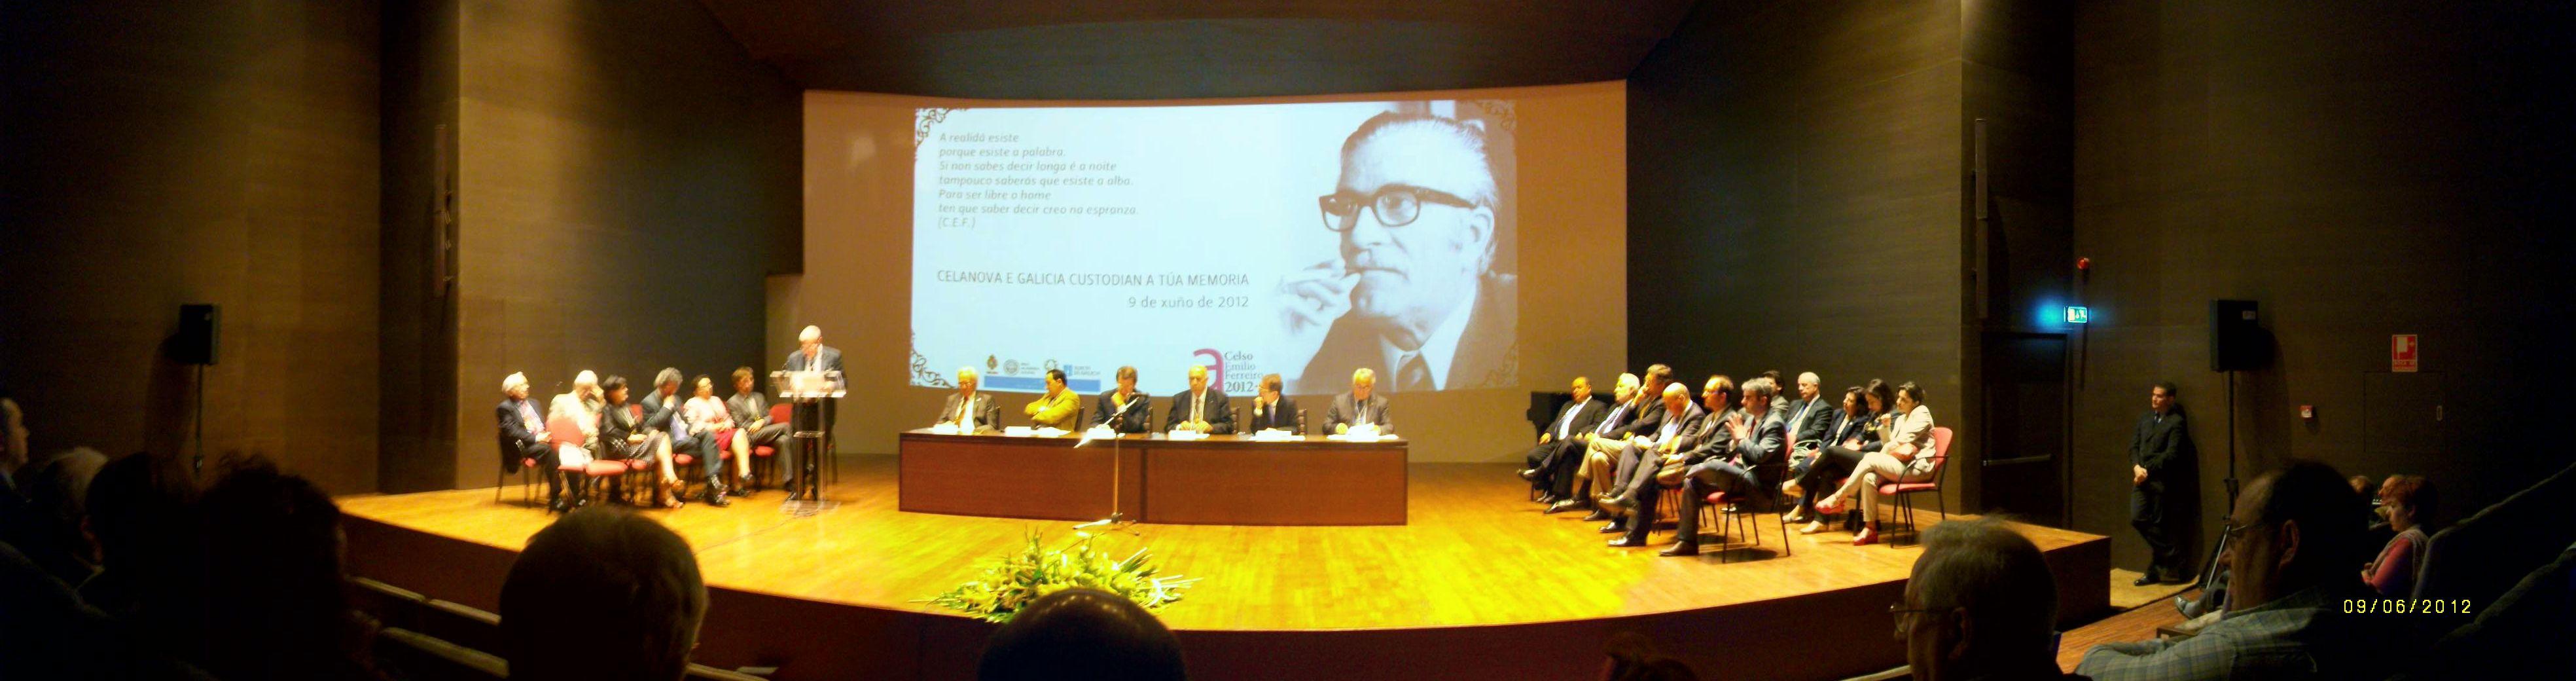 Conferencias Auditorio de Celanova